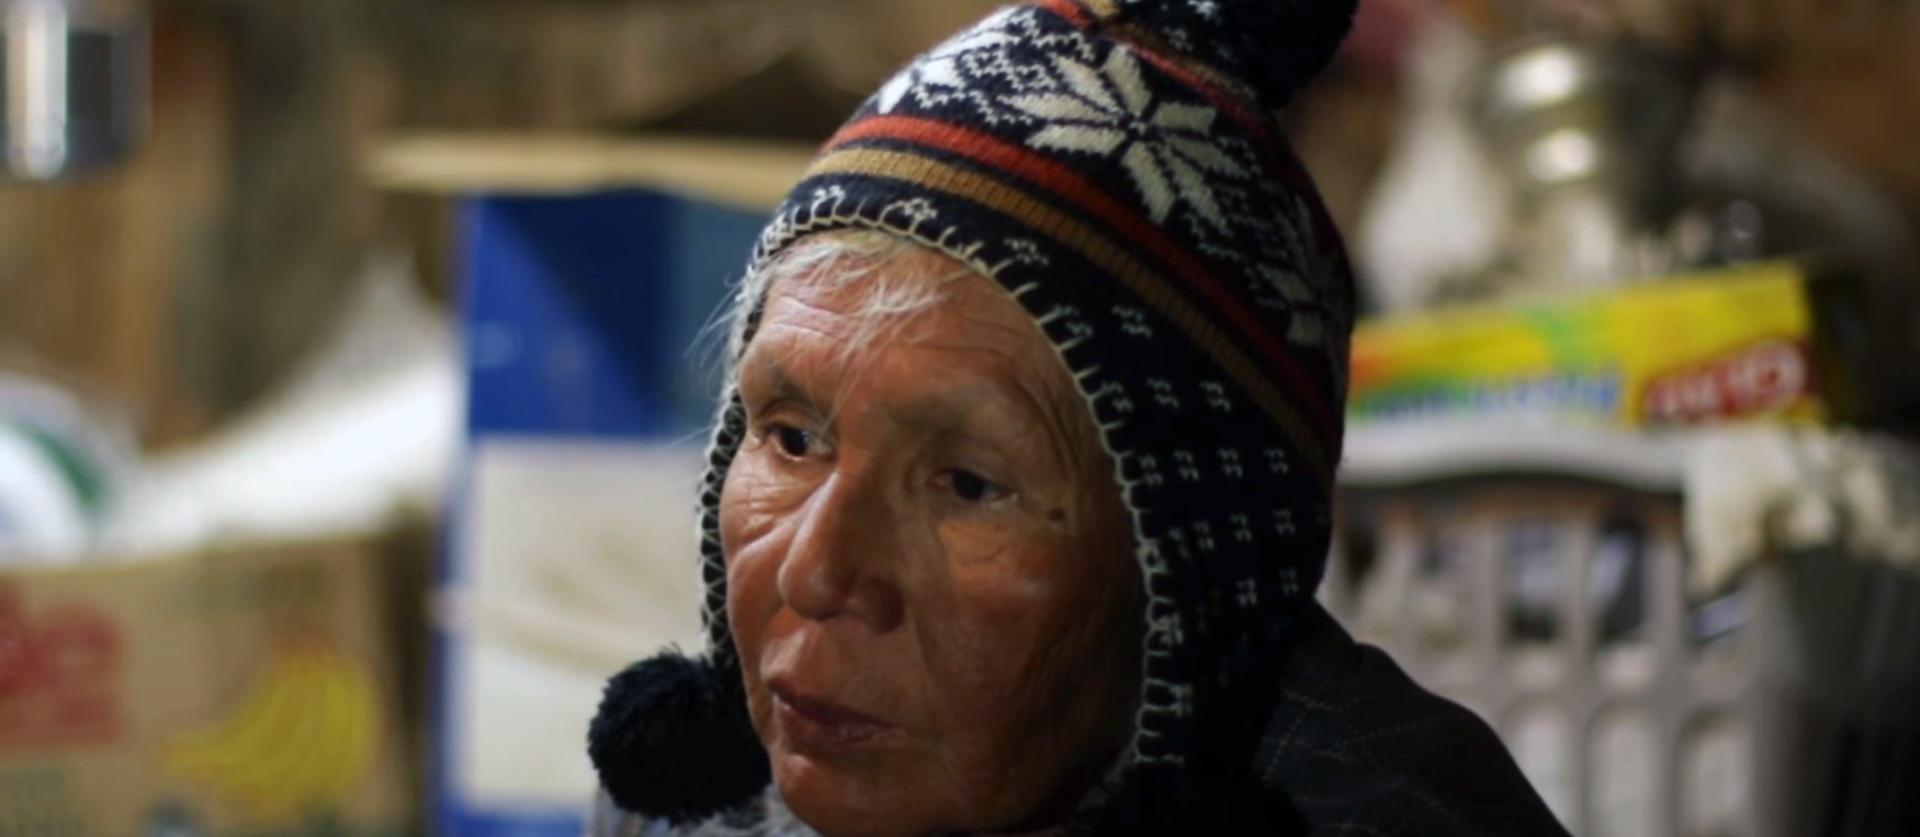 dinetah woman kcet.org.